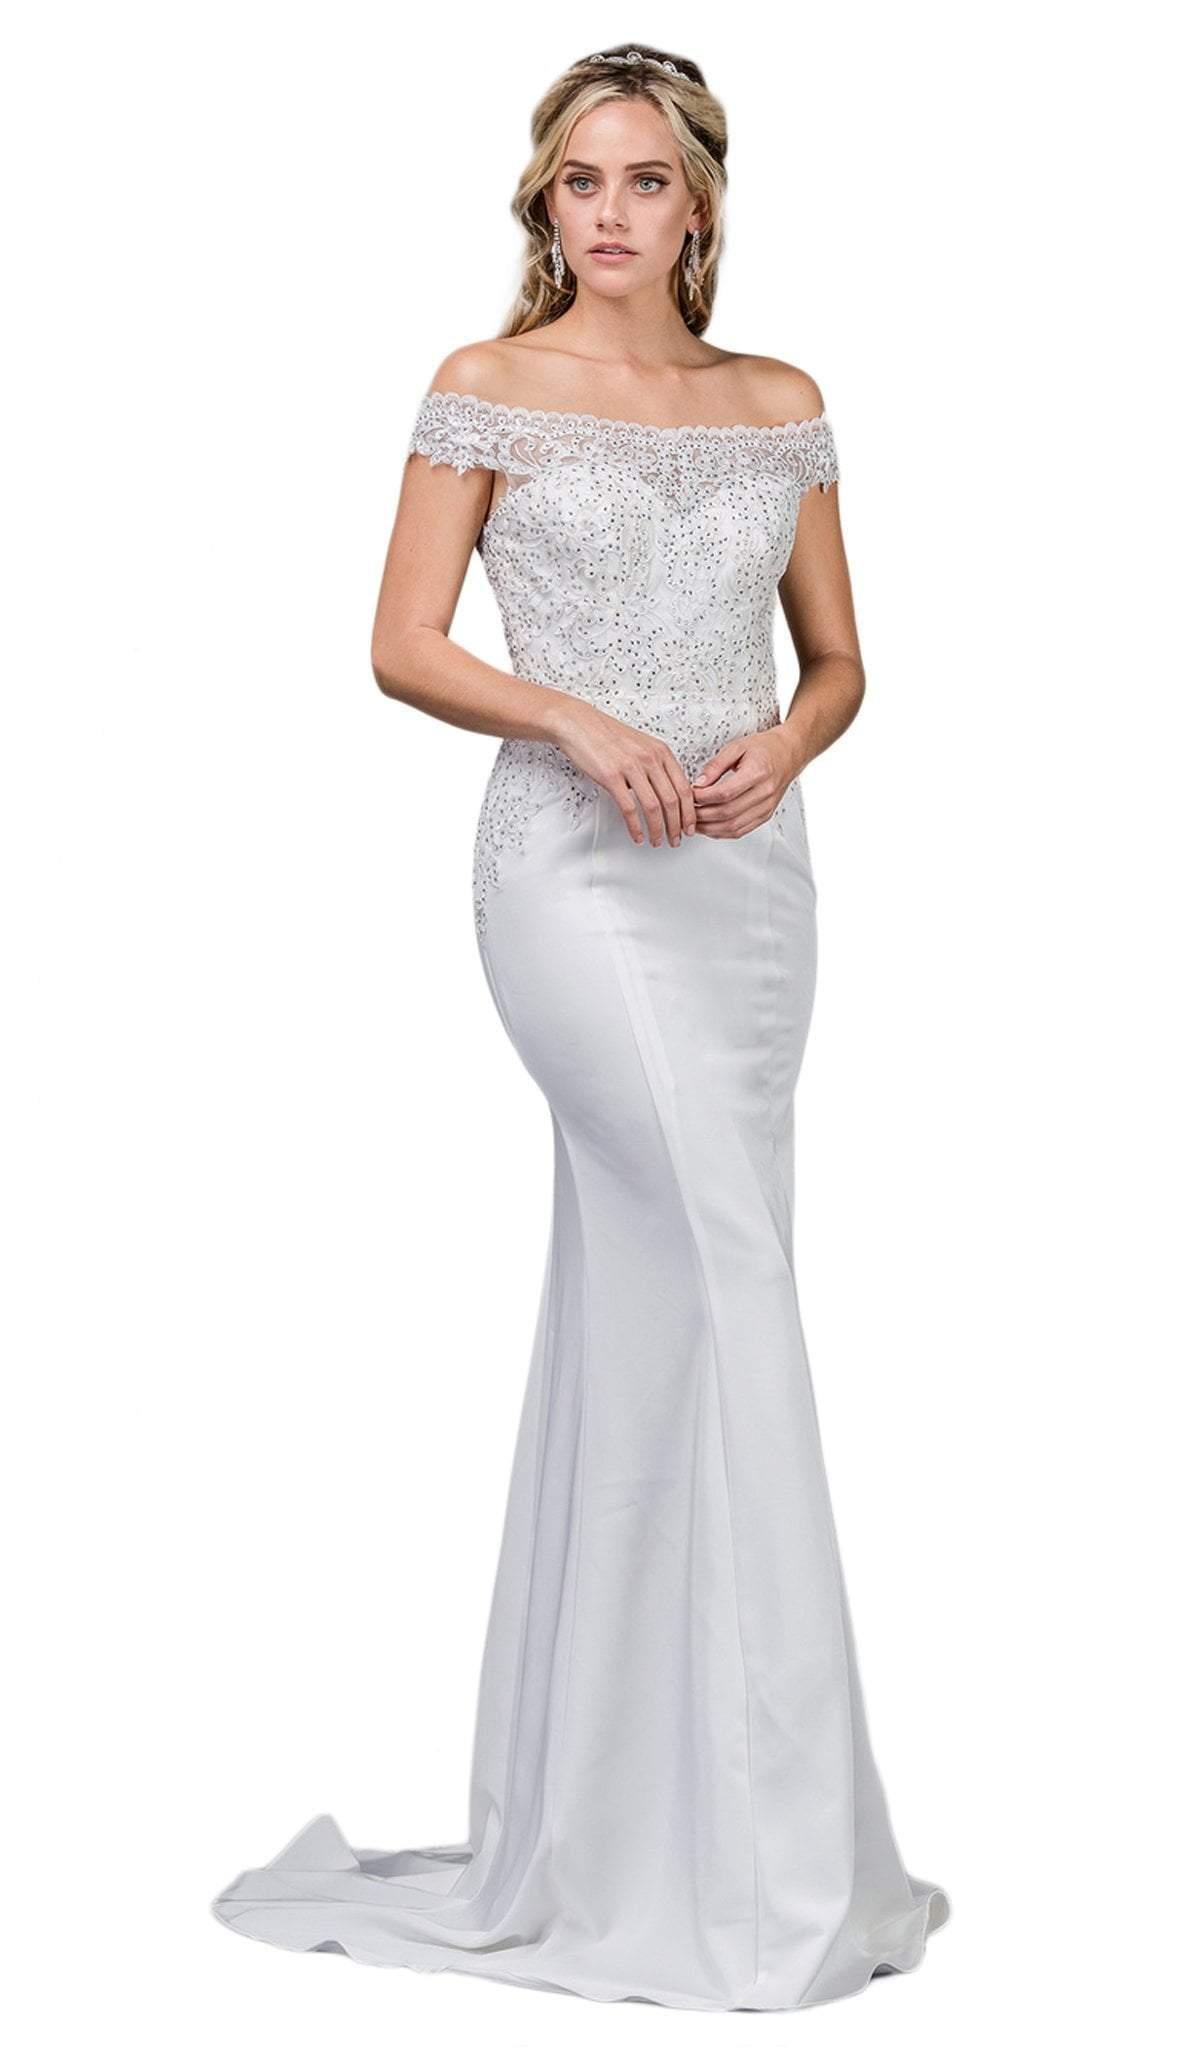 Dancing Queen - 53 Embellished Lace Off-Shoulder Trumpet Wedding Gown